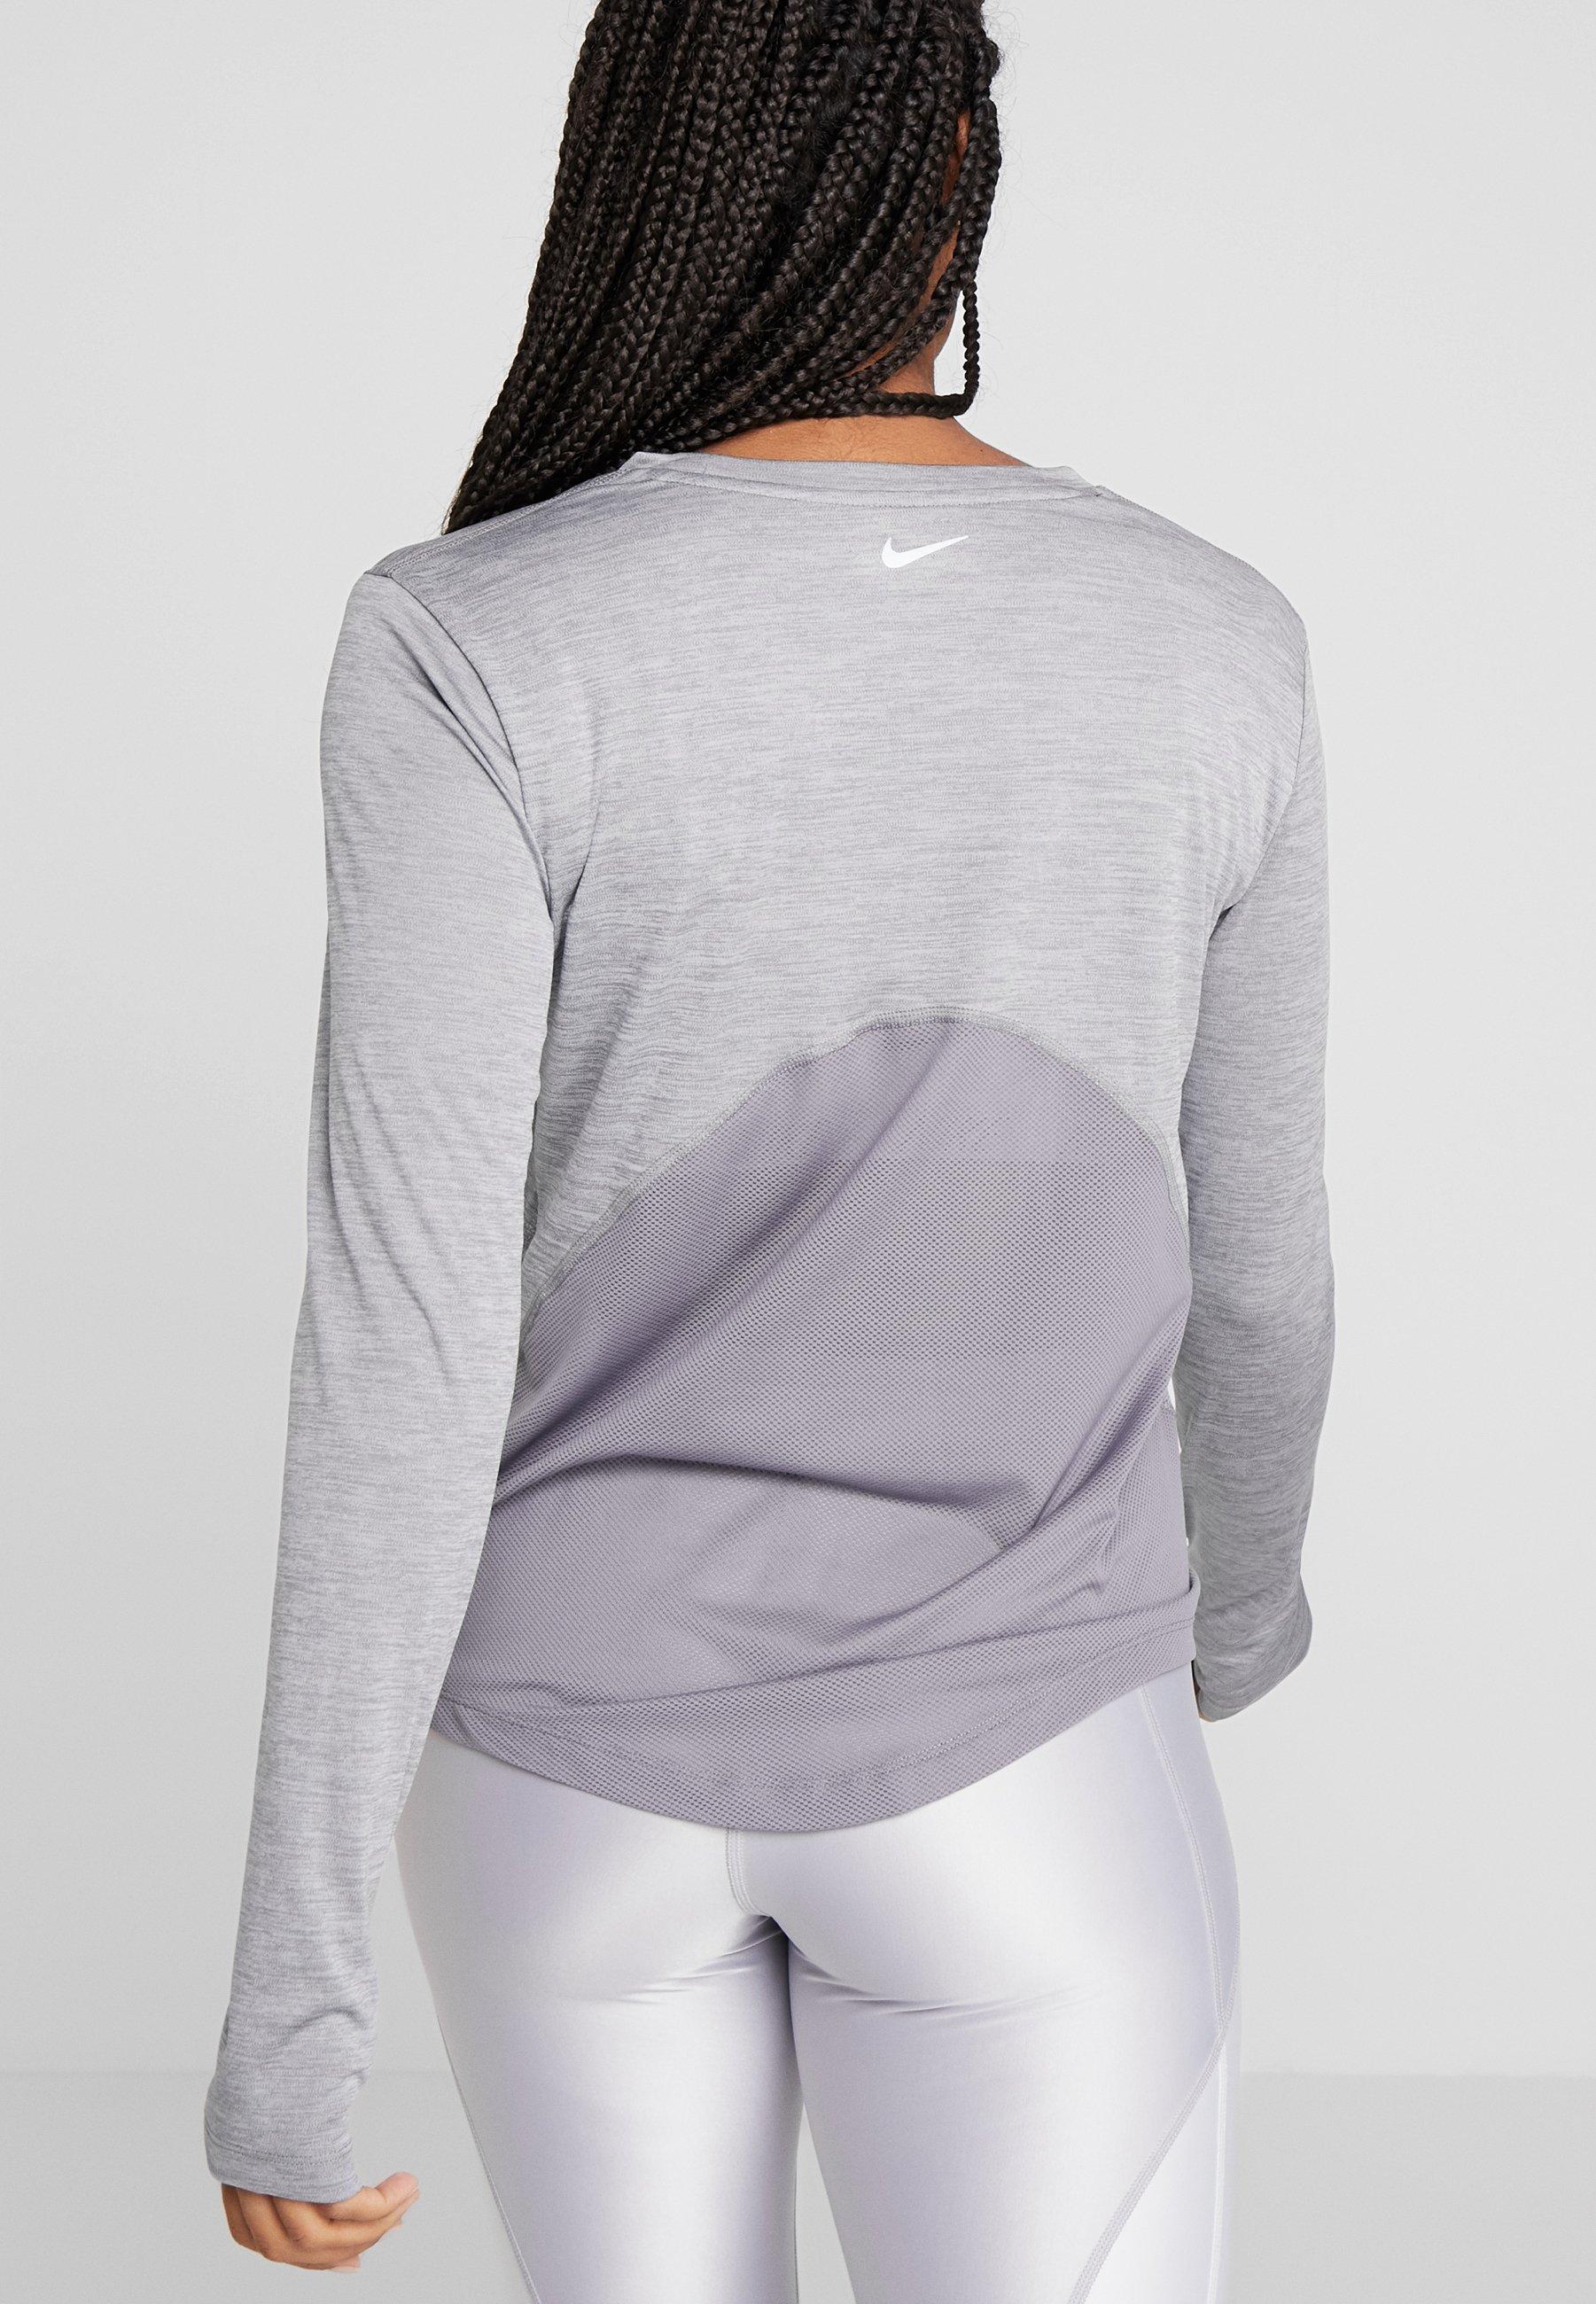 Sport MilerT heather Performance shirt De silver Nike Gunsmoke dCxEroeWQB